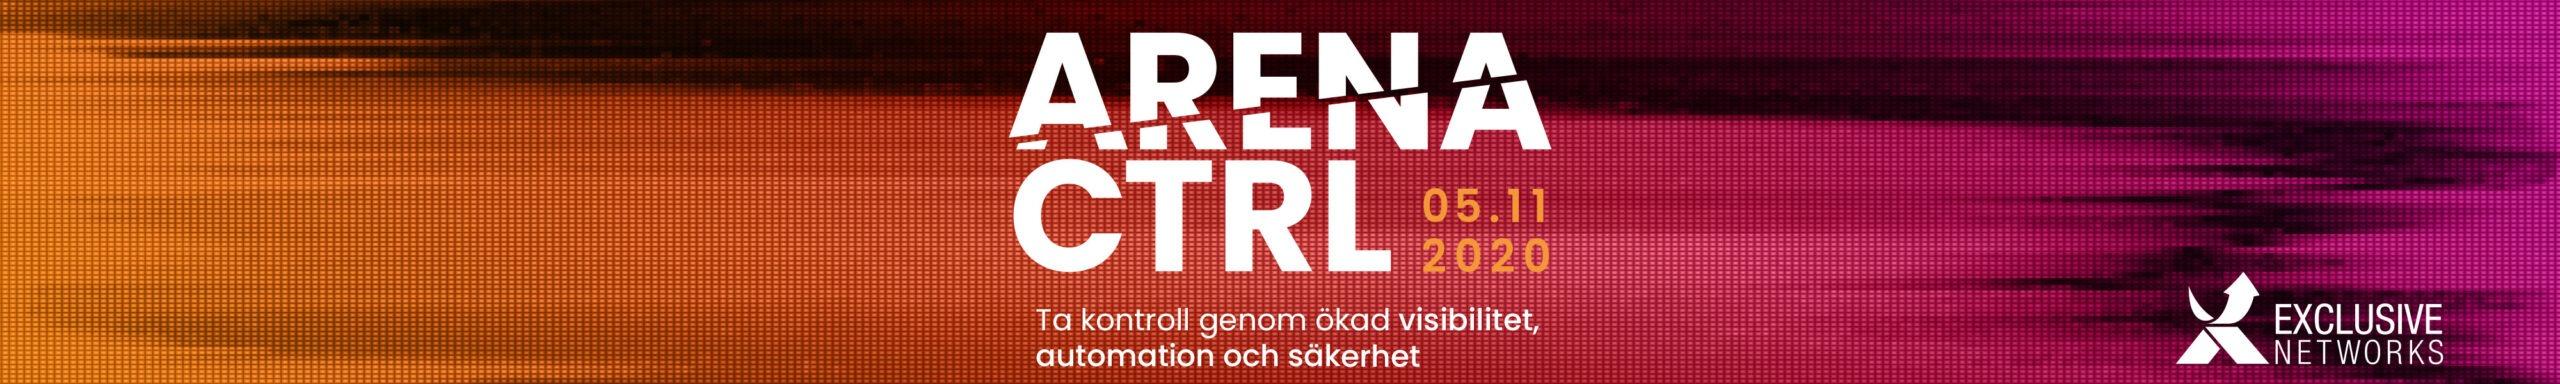 ARENA CTRL 05.11.2020 3